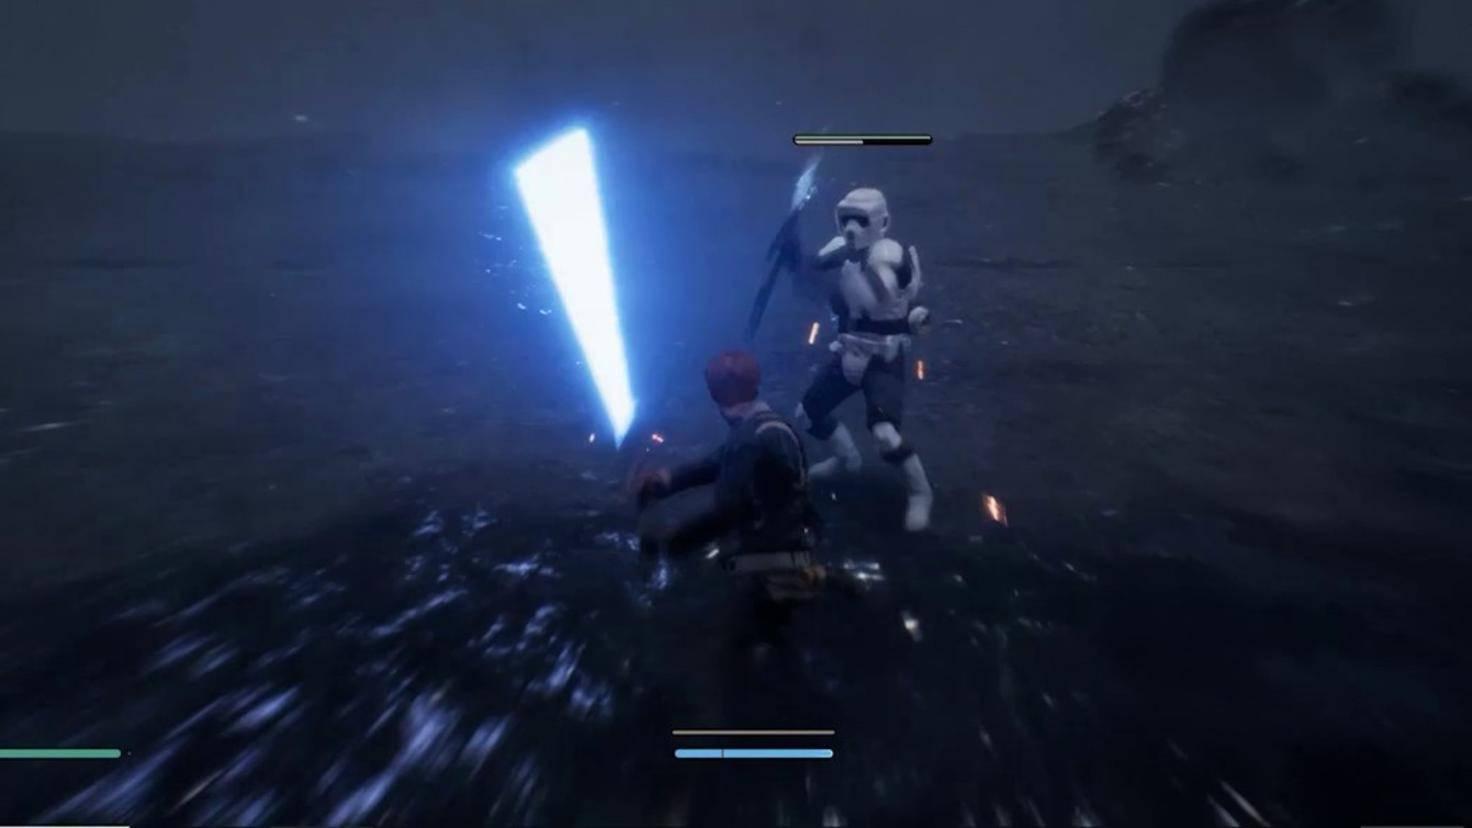 star-wars-jedi-fallen-order-kampf-block-meter-screenshot